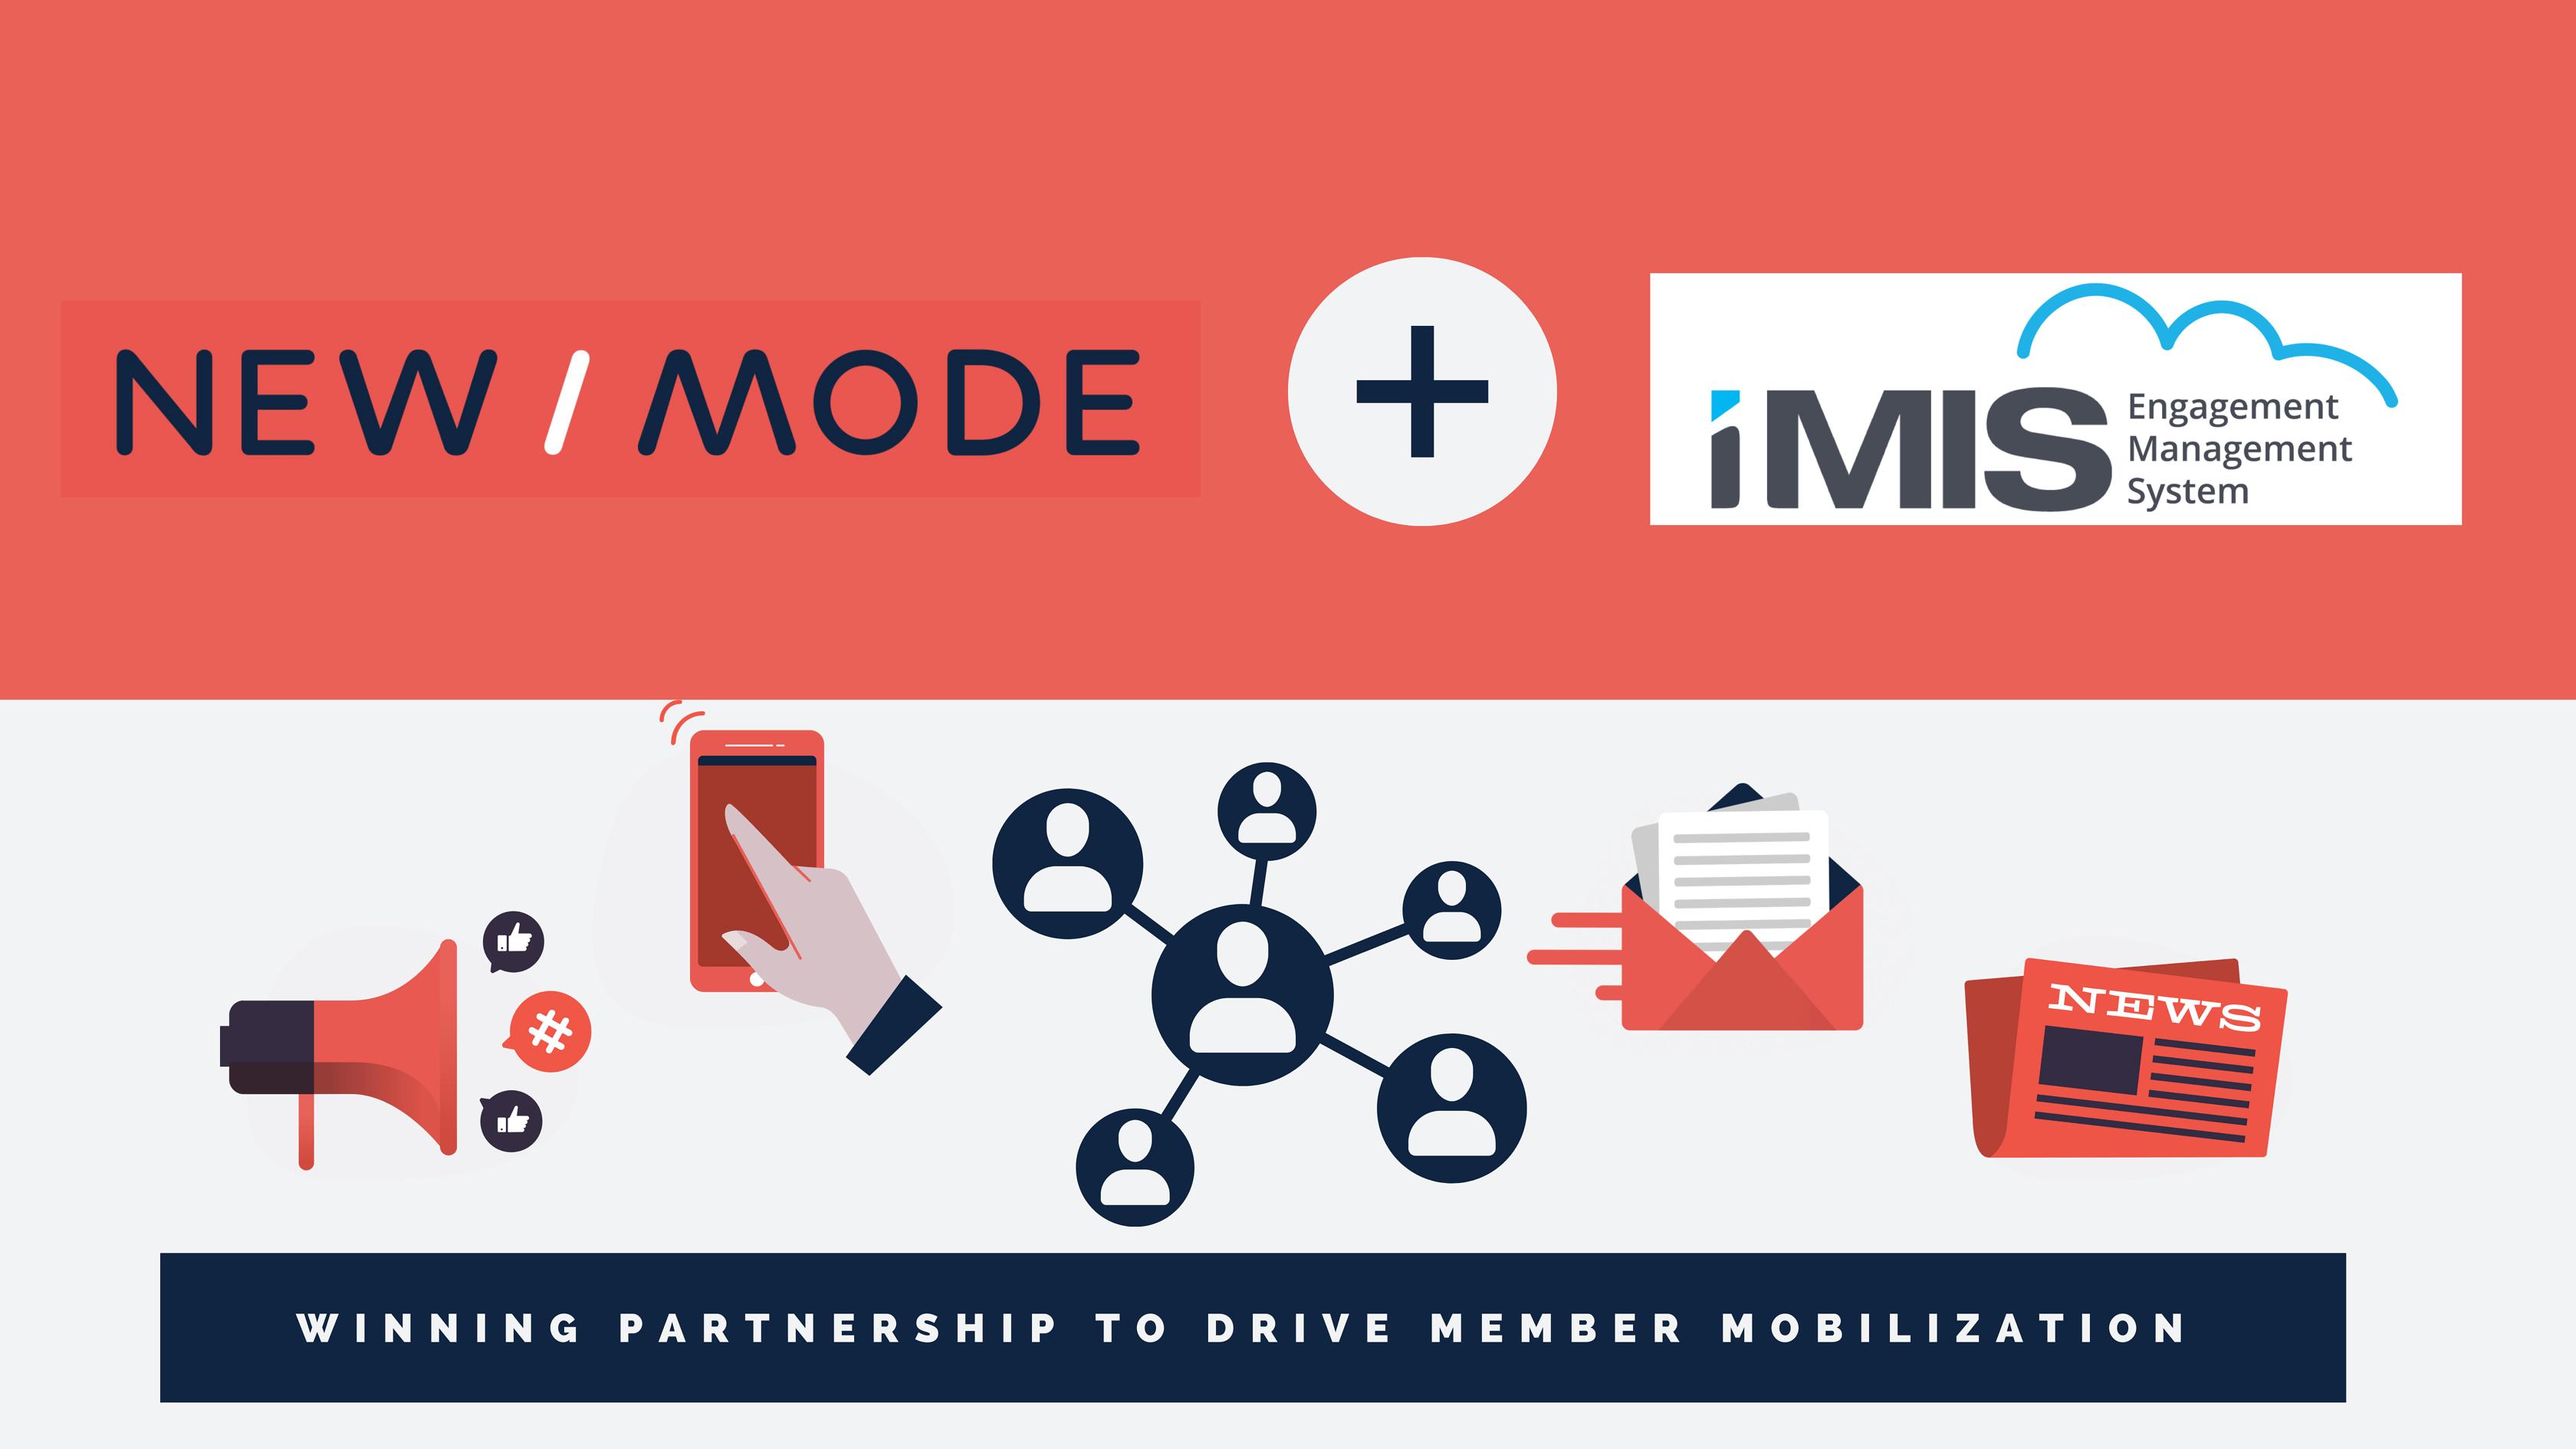 New Mode iMIS integration